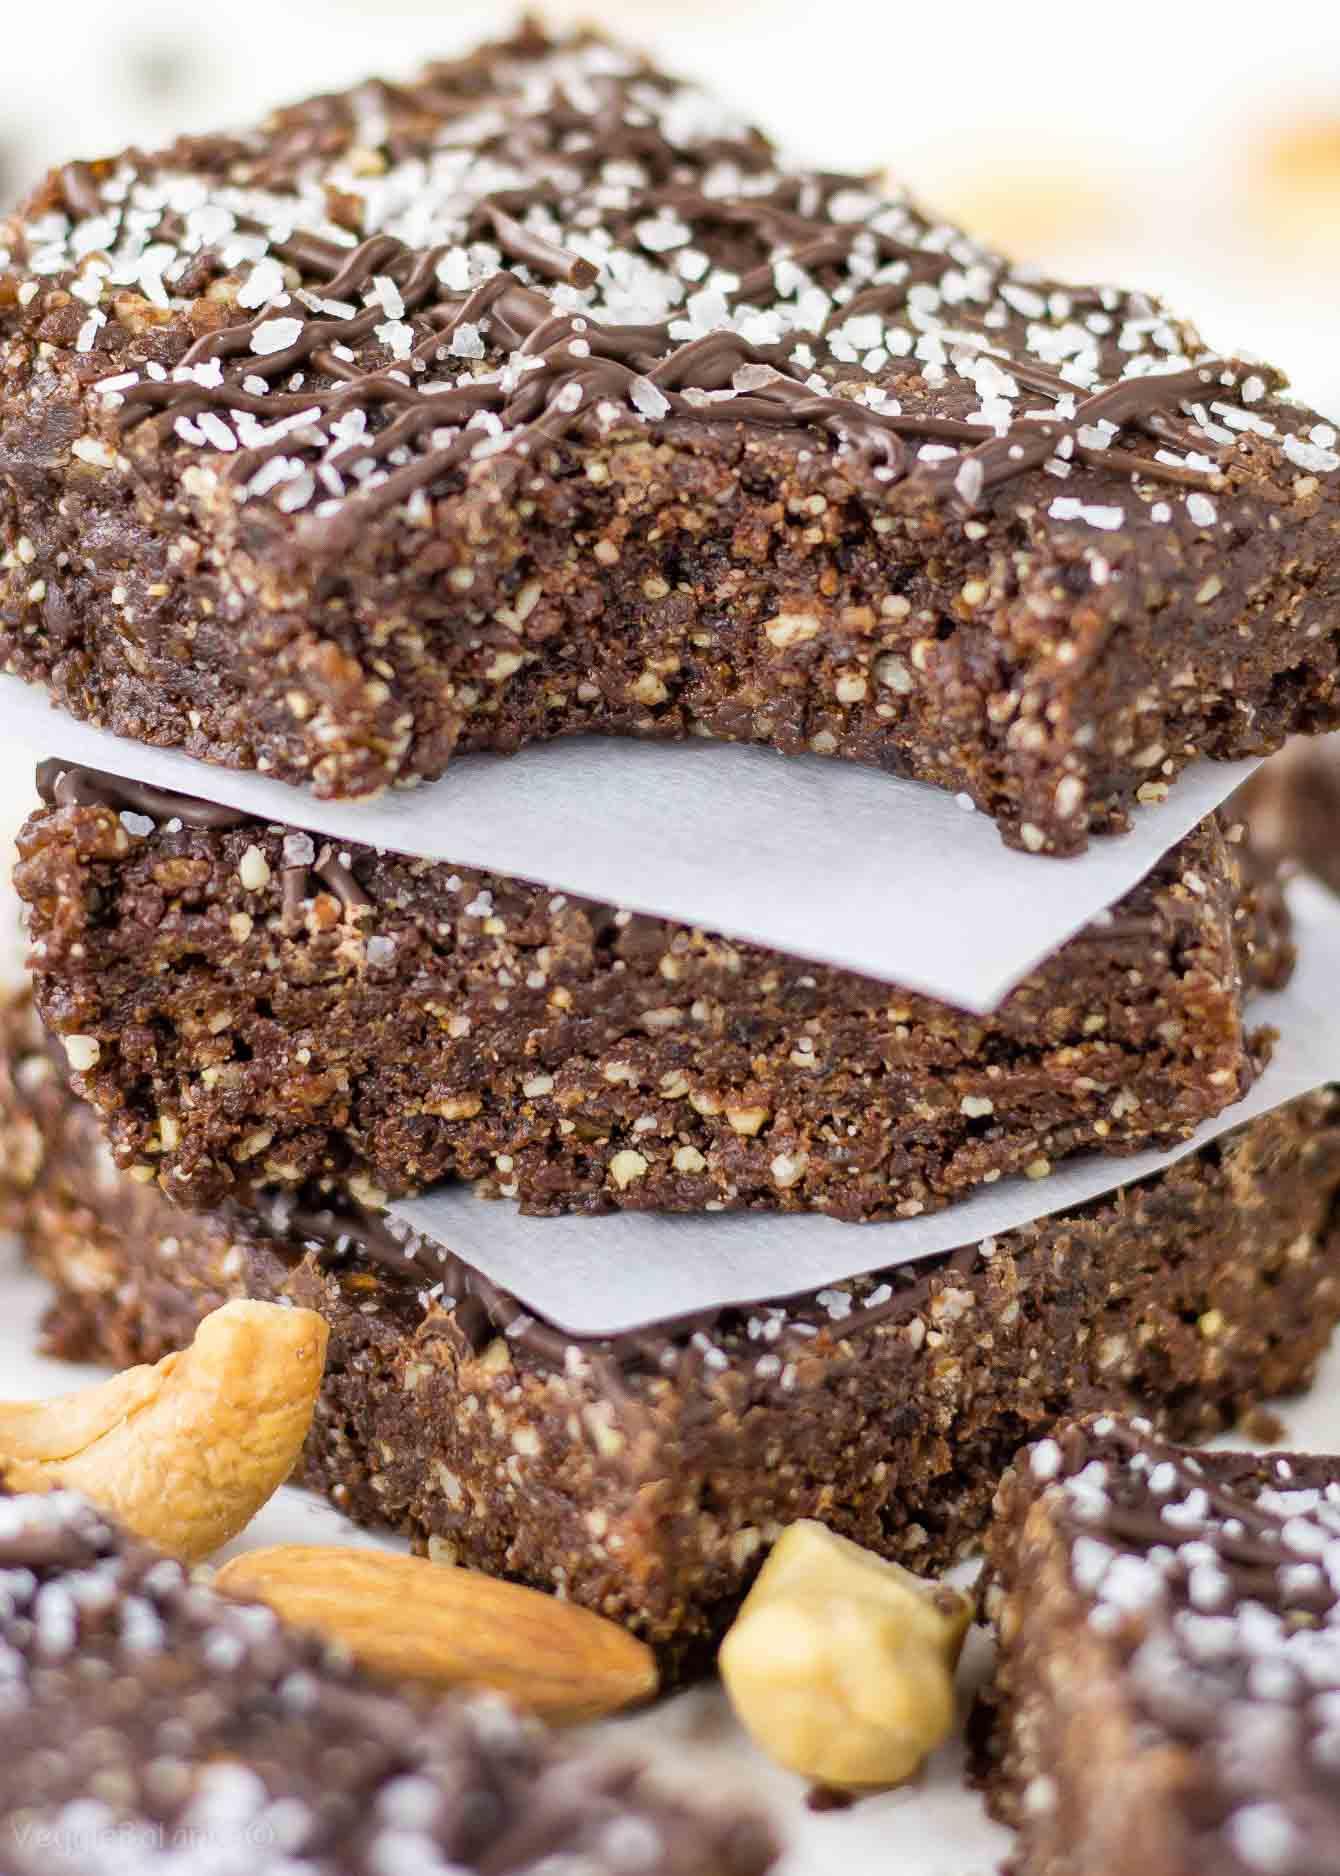 Chocolate Sea Salt Energy Bars Gluten Free - veggiebalance.com